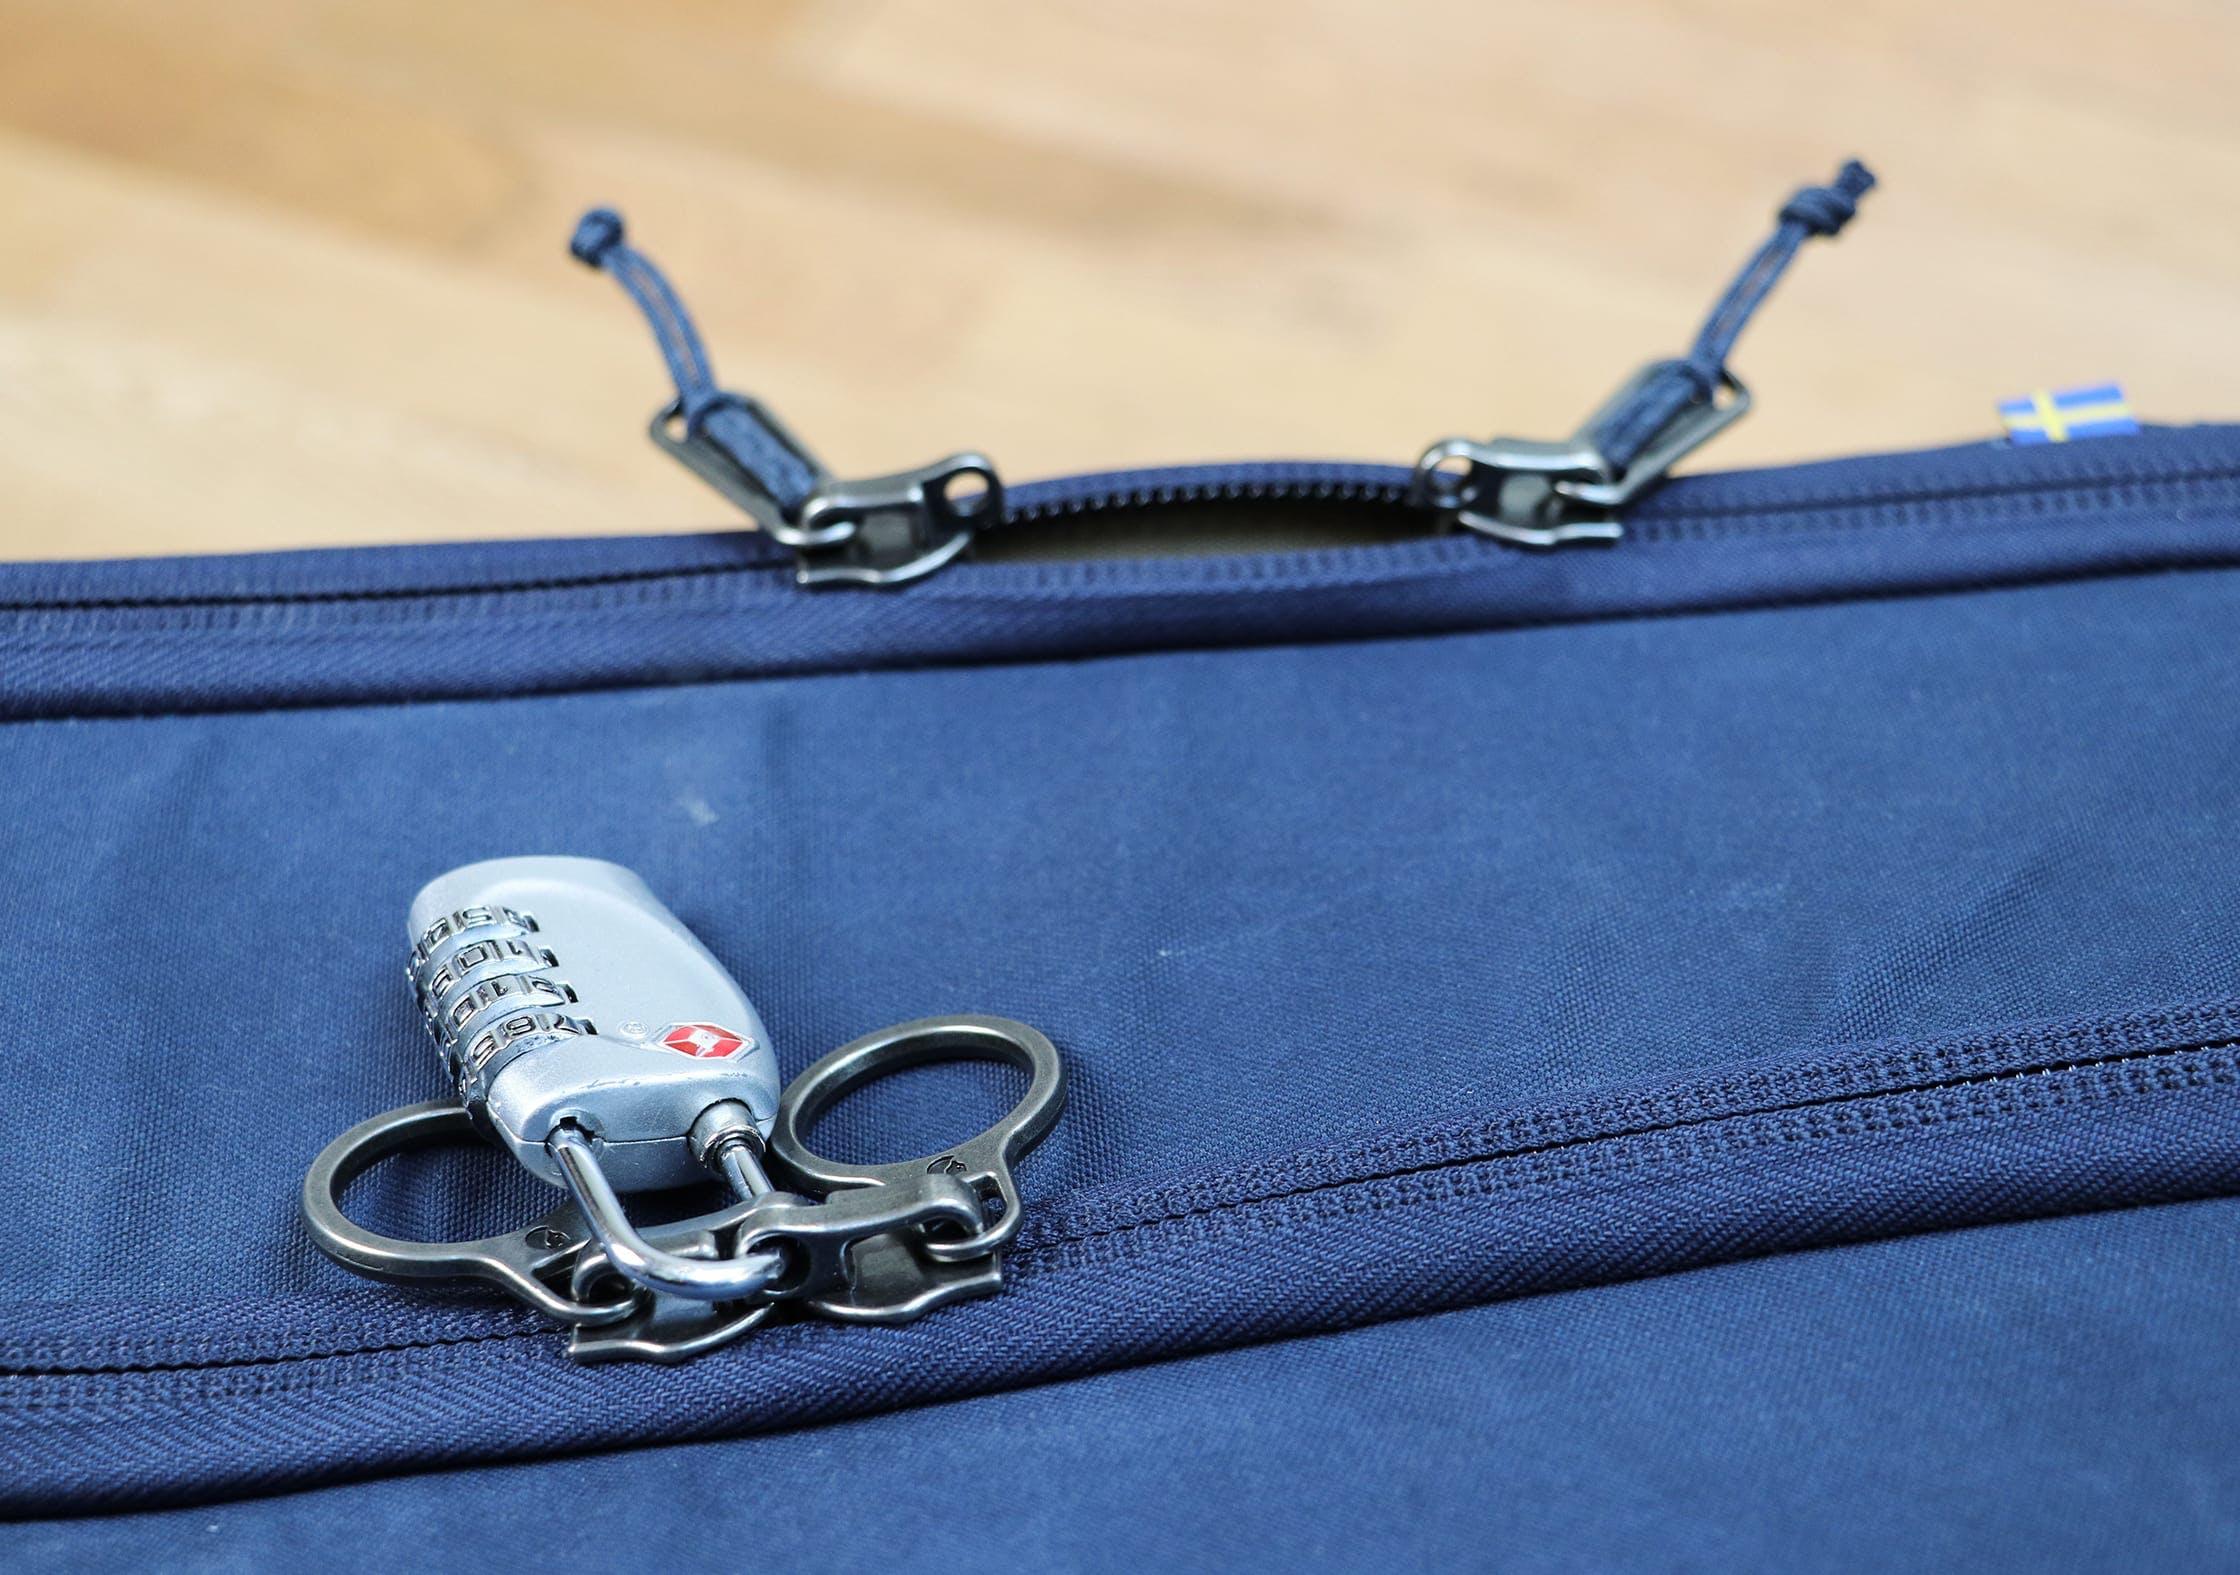 Fjallraven Travel Pack Lockable YKK Zips